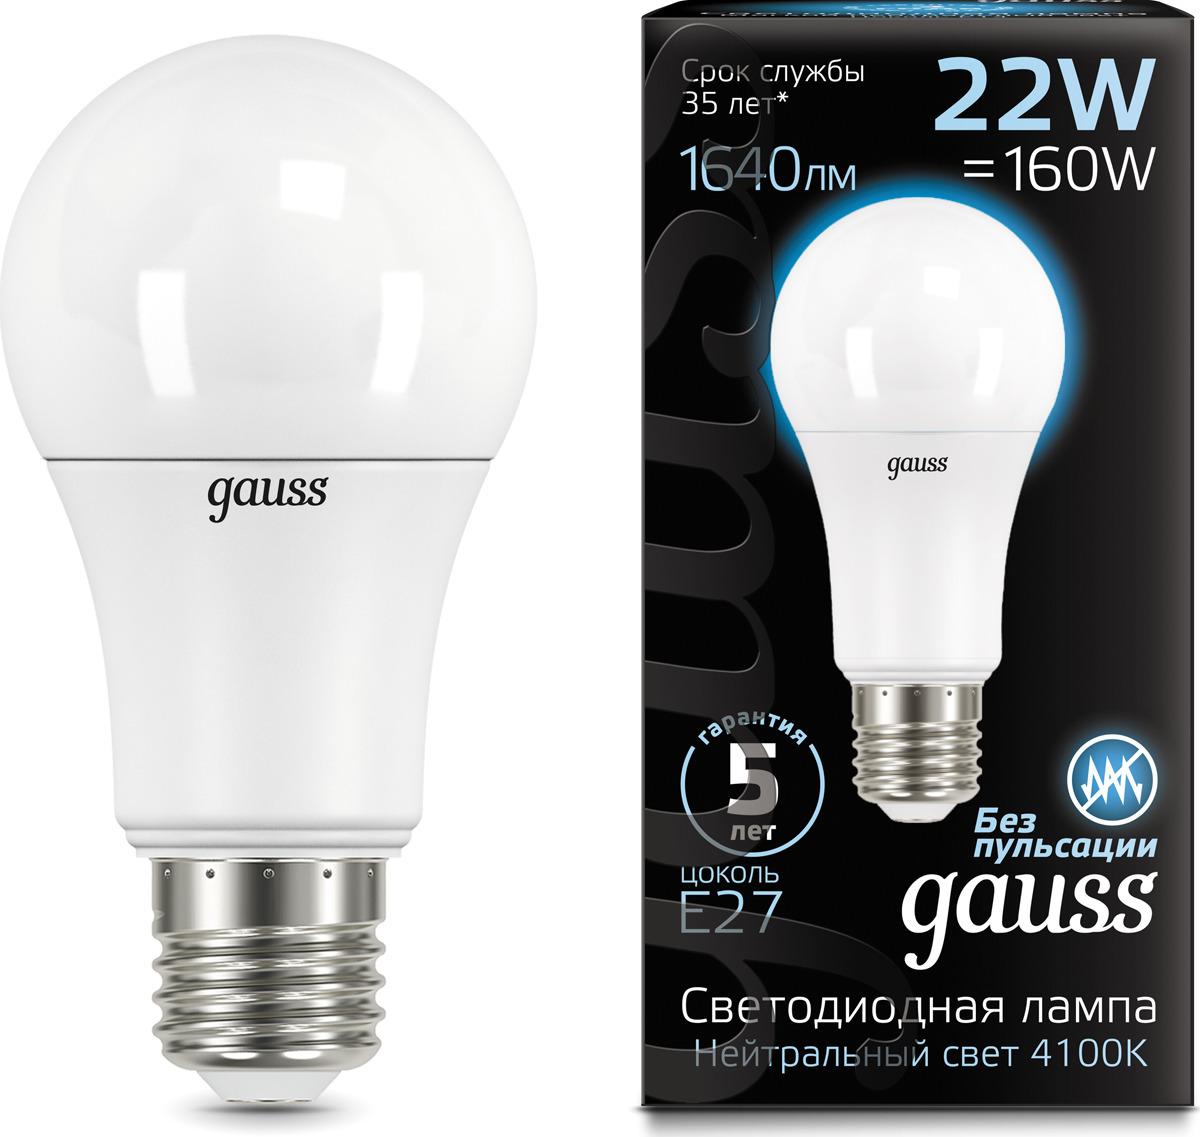 Лампочка Gauss Black LED, A70, E27, 22W. 102502222 gauss black led a70 e27 22w 4100k 102502222